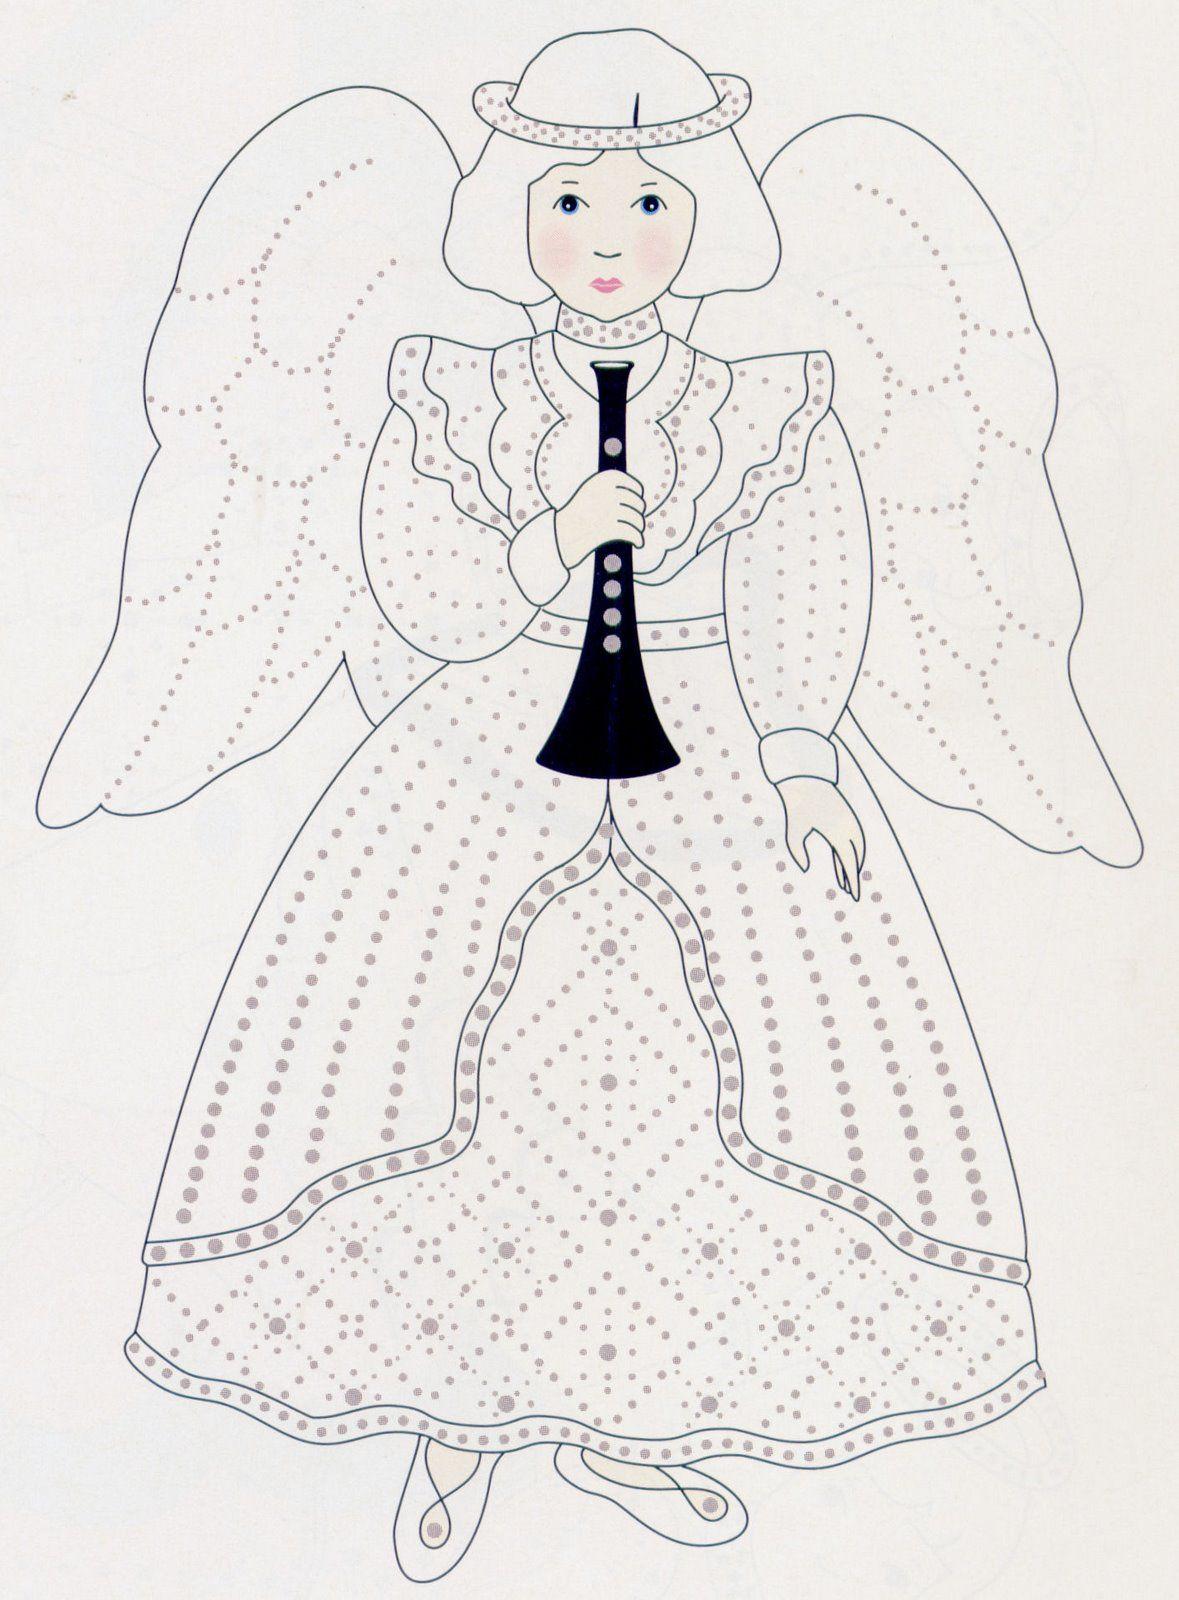 A paper craft idea paper angels angel craft and parchment design a paper craft idea paper angels marges8s blog jeuxipadfo Images